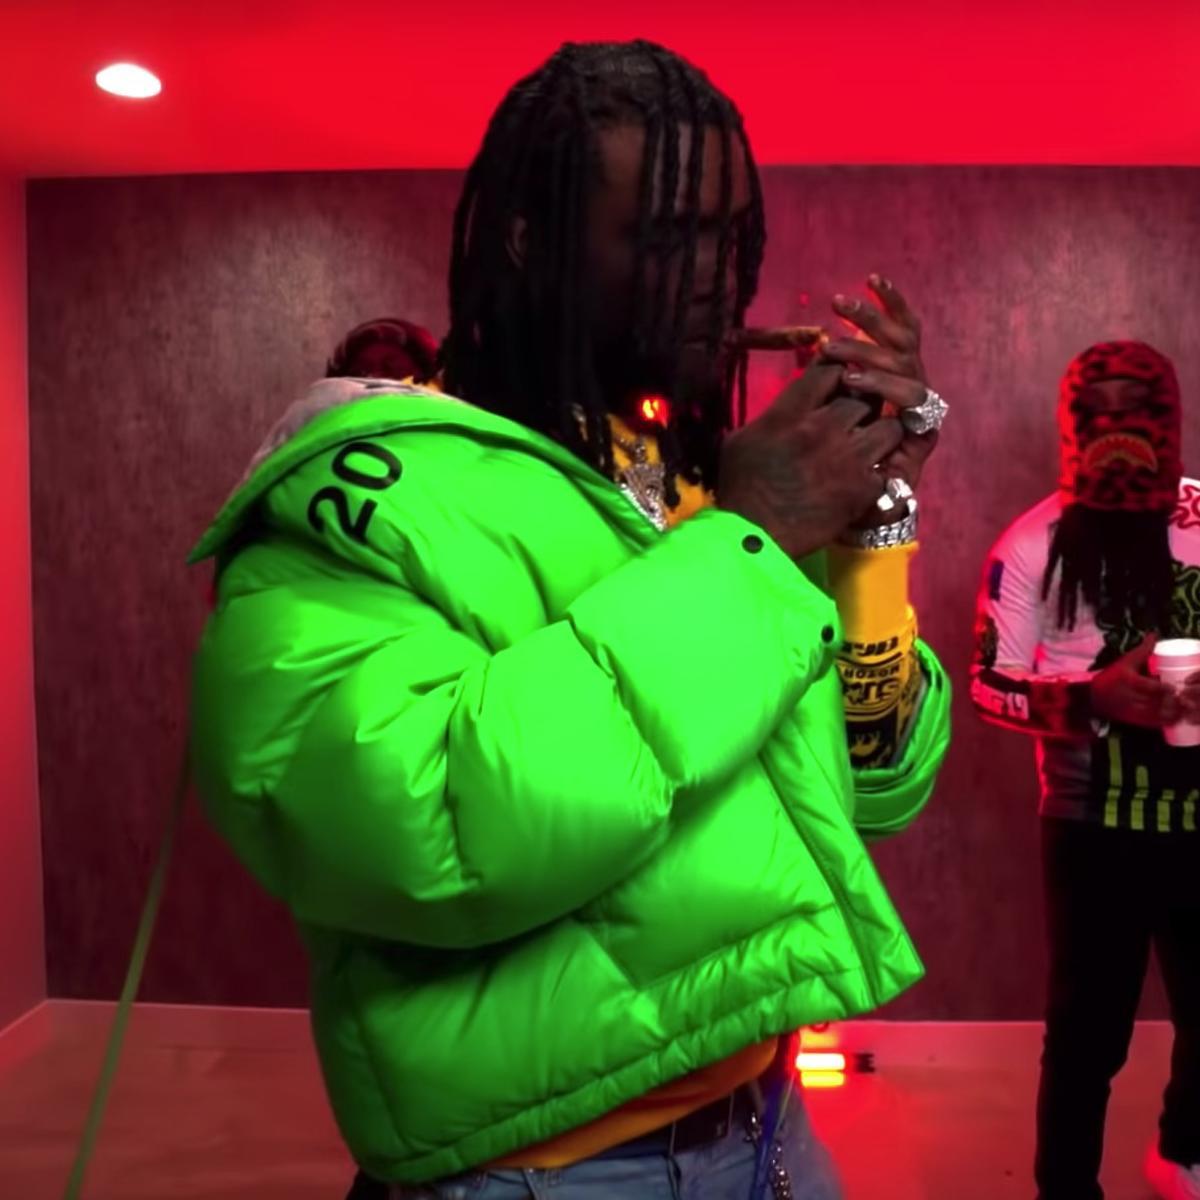 Chief Keef Hood Audio Lyrics Download Mp3 Music Lyrics